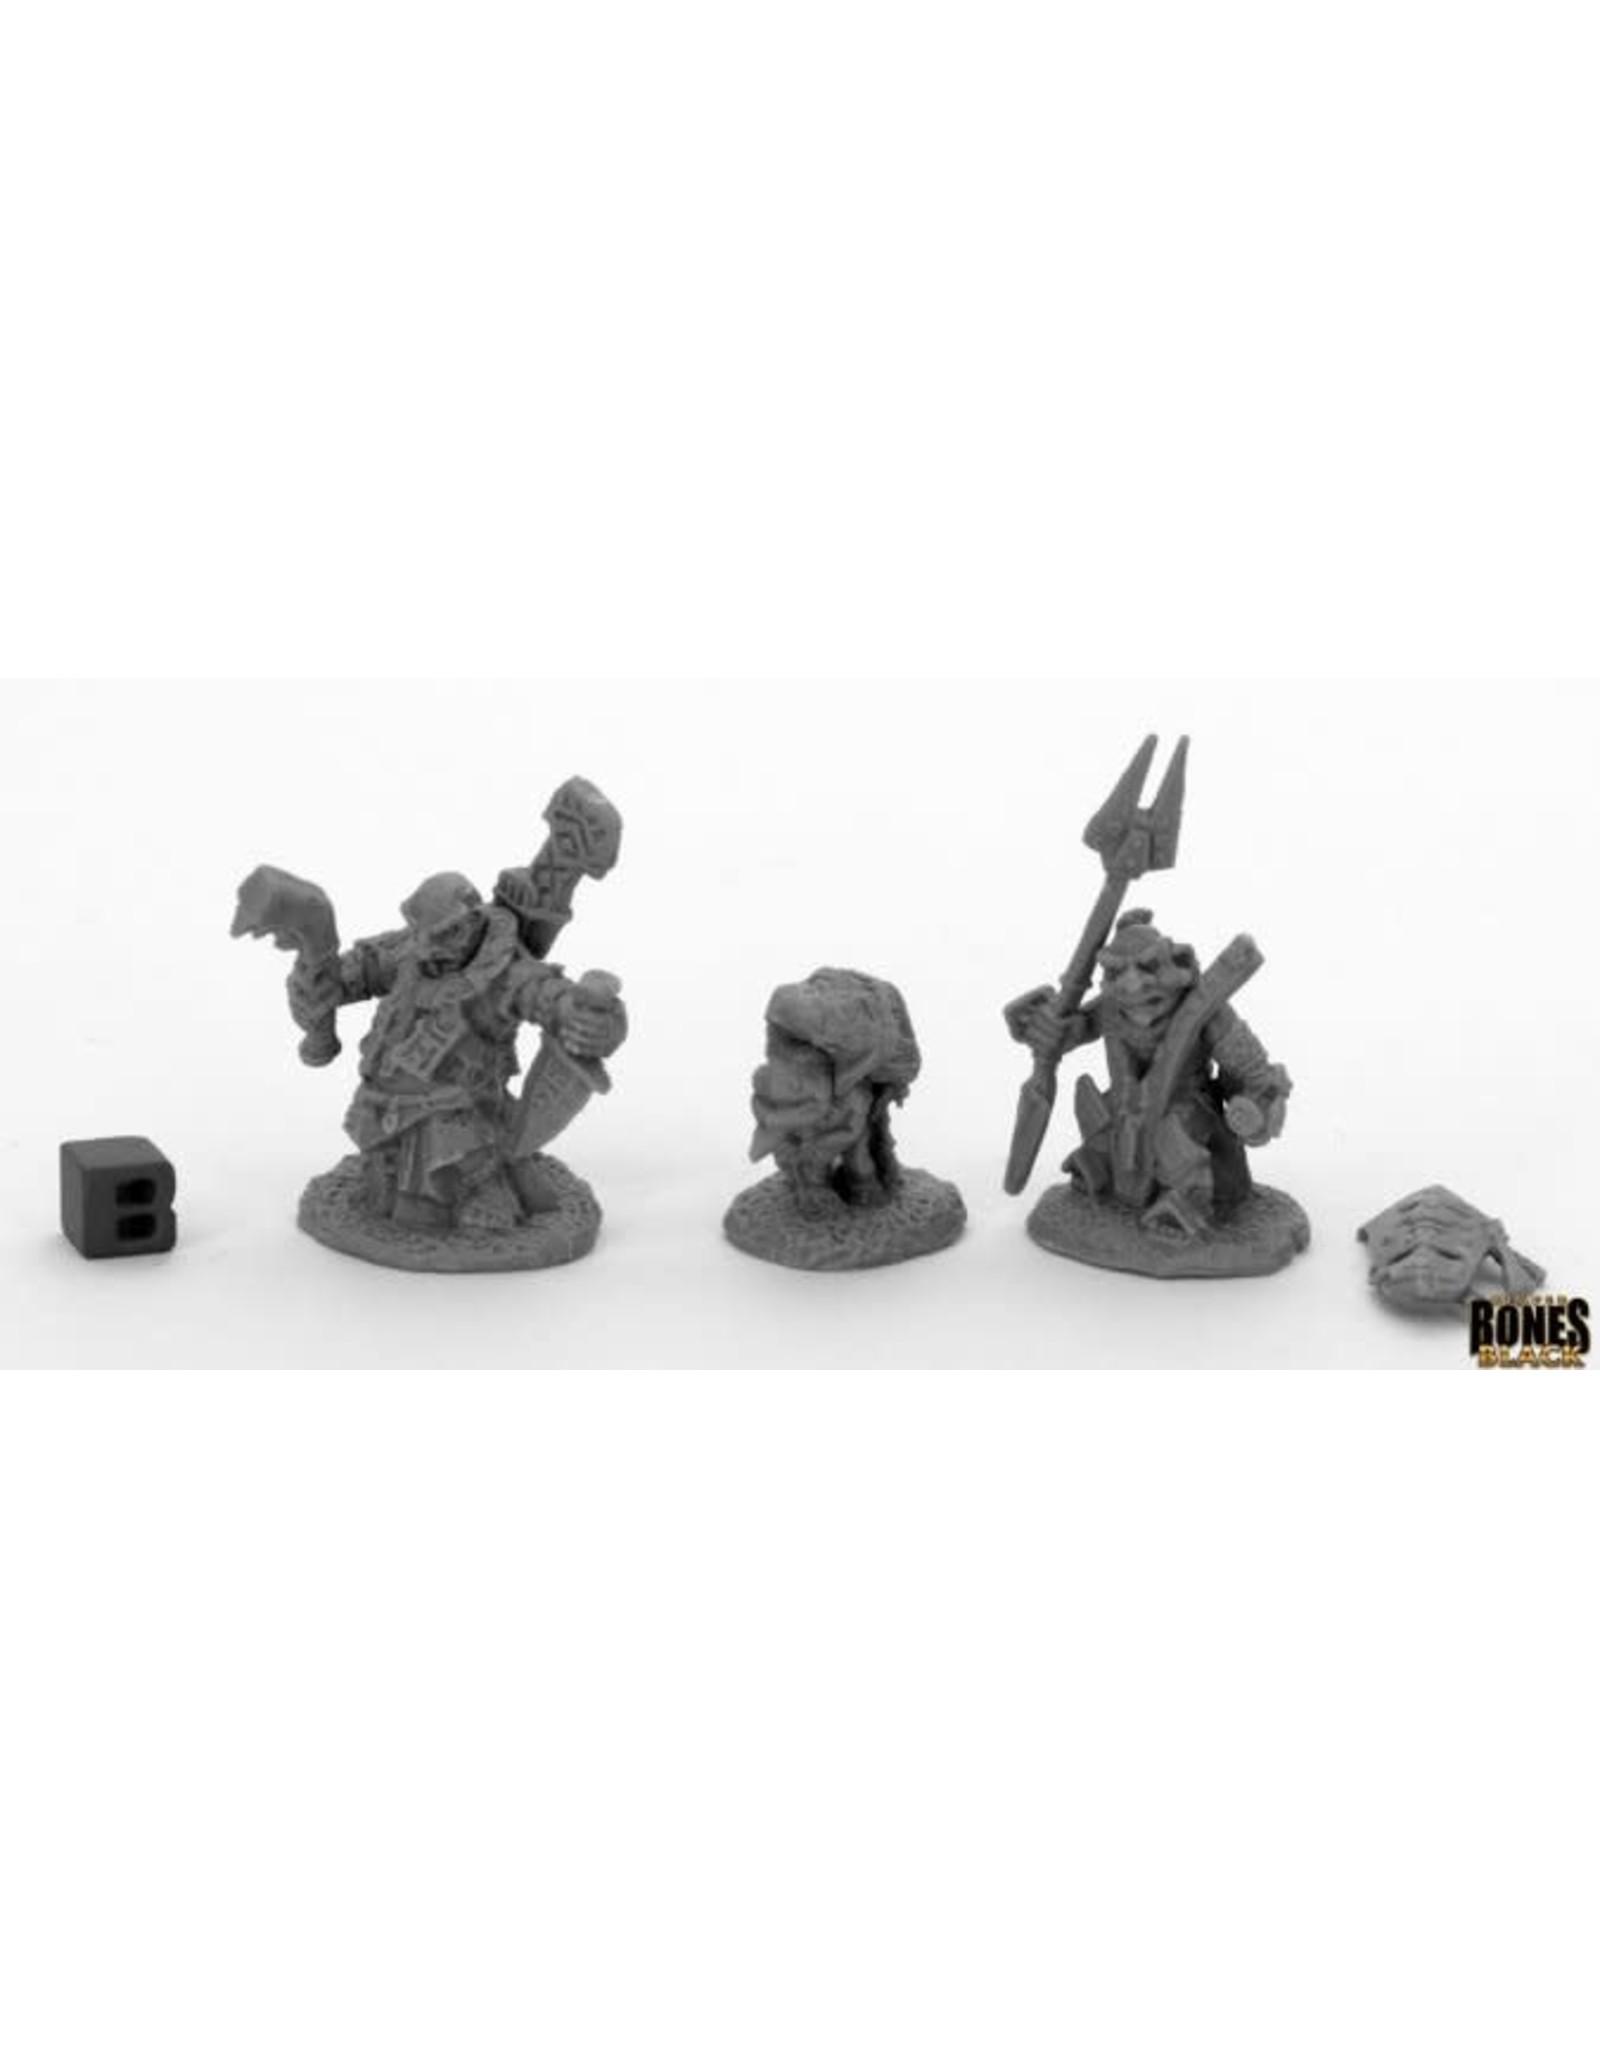 Reaper Miniatures Bones Black: Bloodstone Gnome Heroes